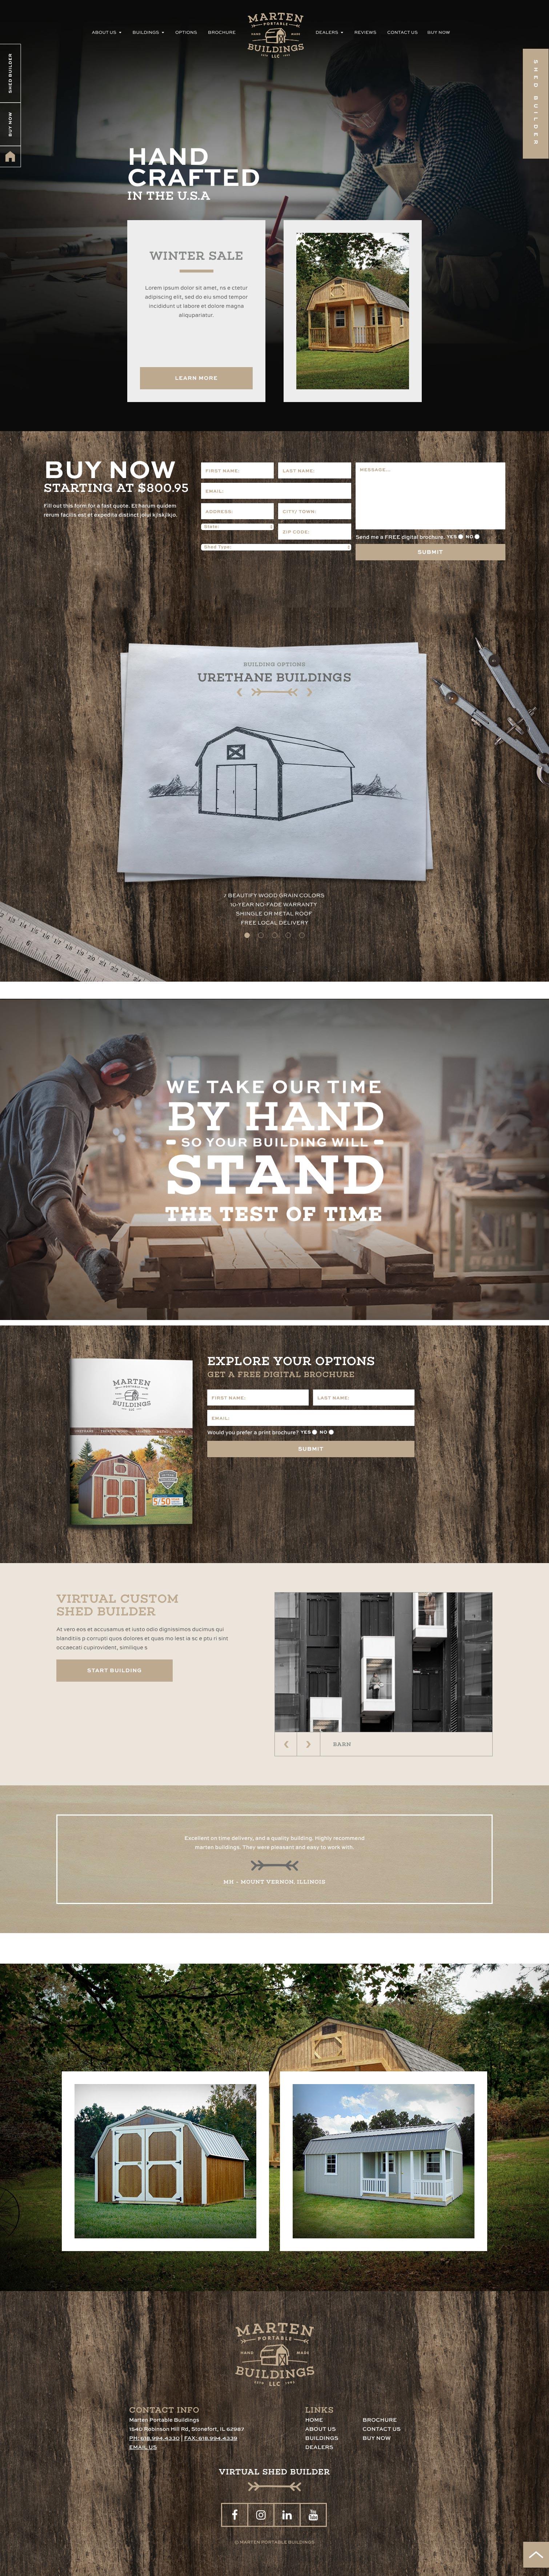 Marten Portable Buildings New Website Scrolling Version